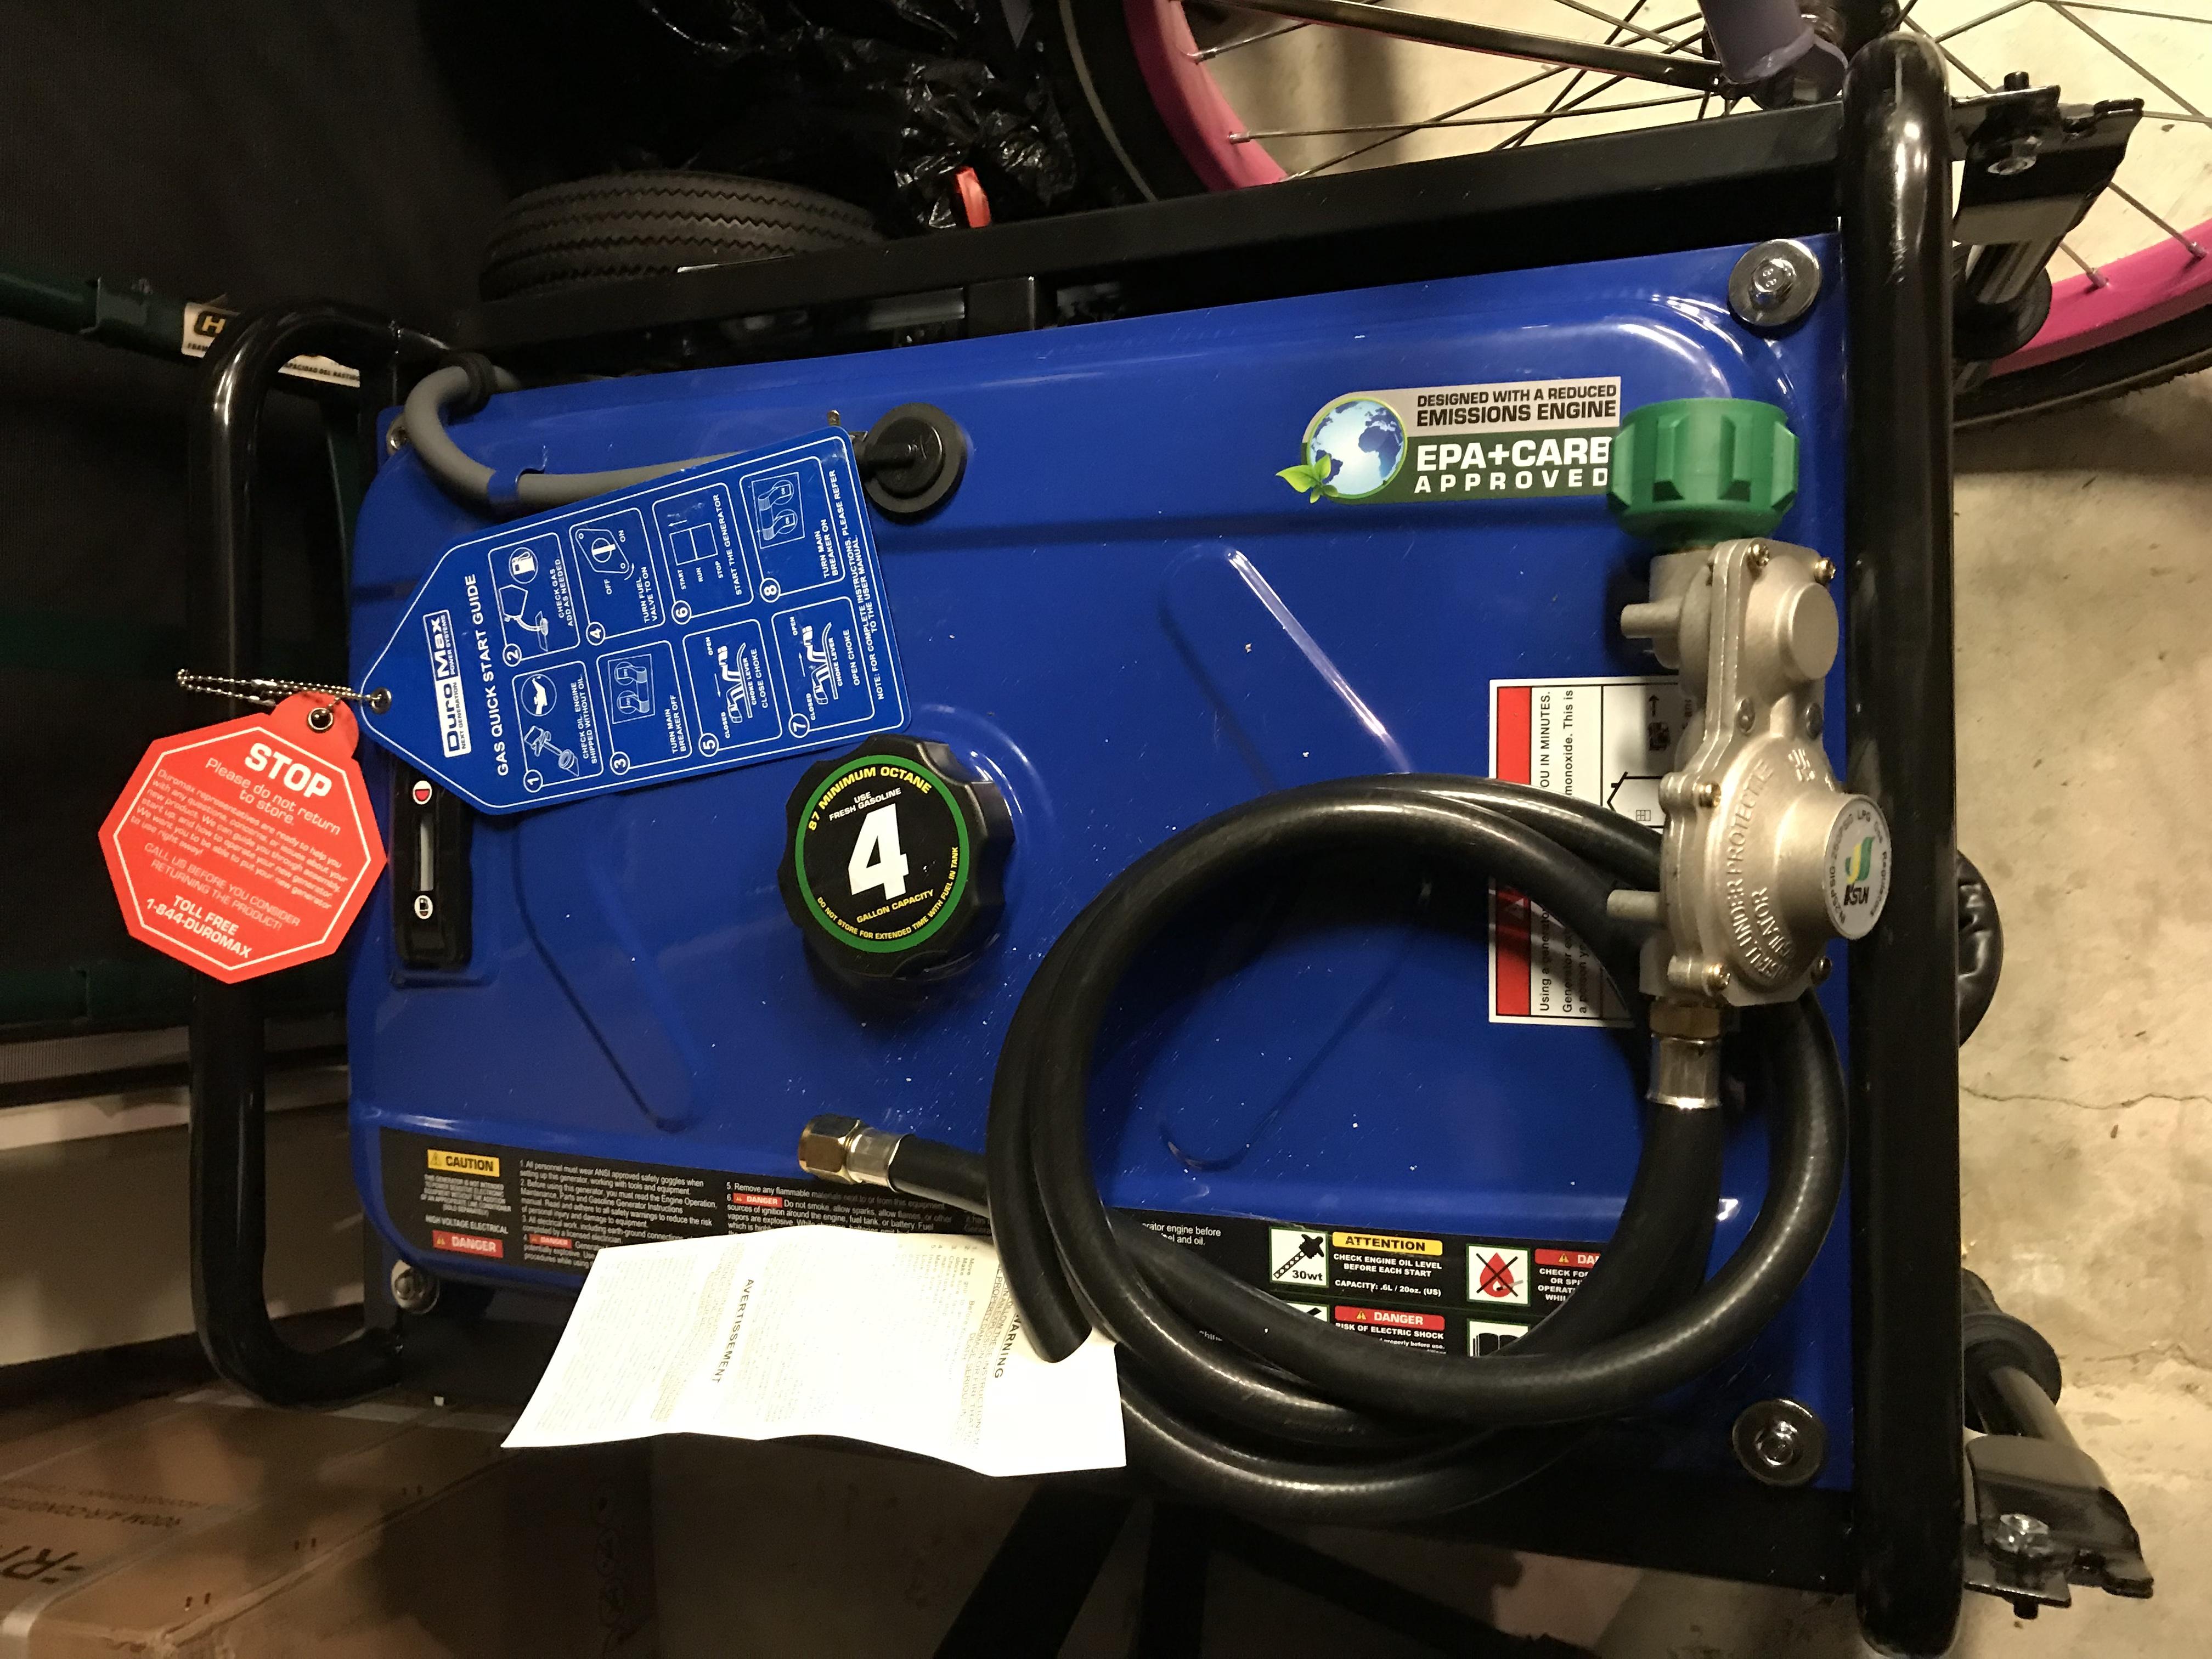 Generator help-3fe18524-6637-4da7-bdd6-c03efcca4a25.jpeg